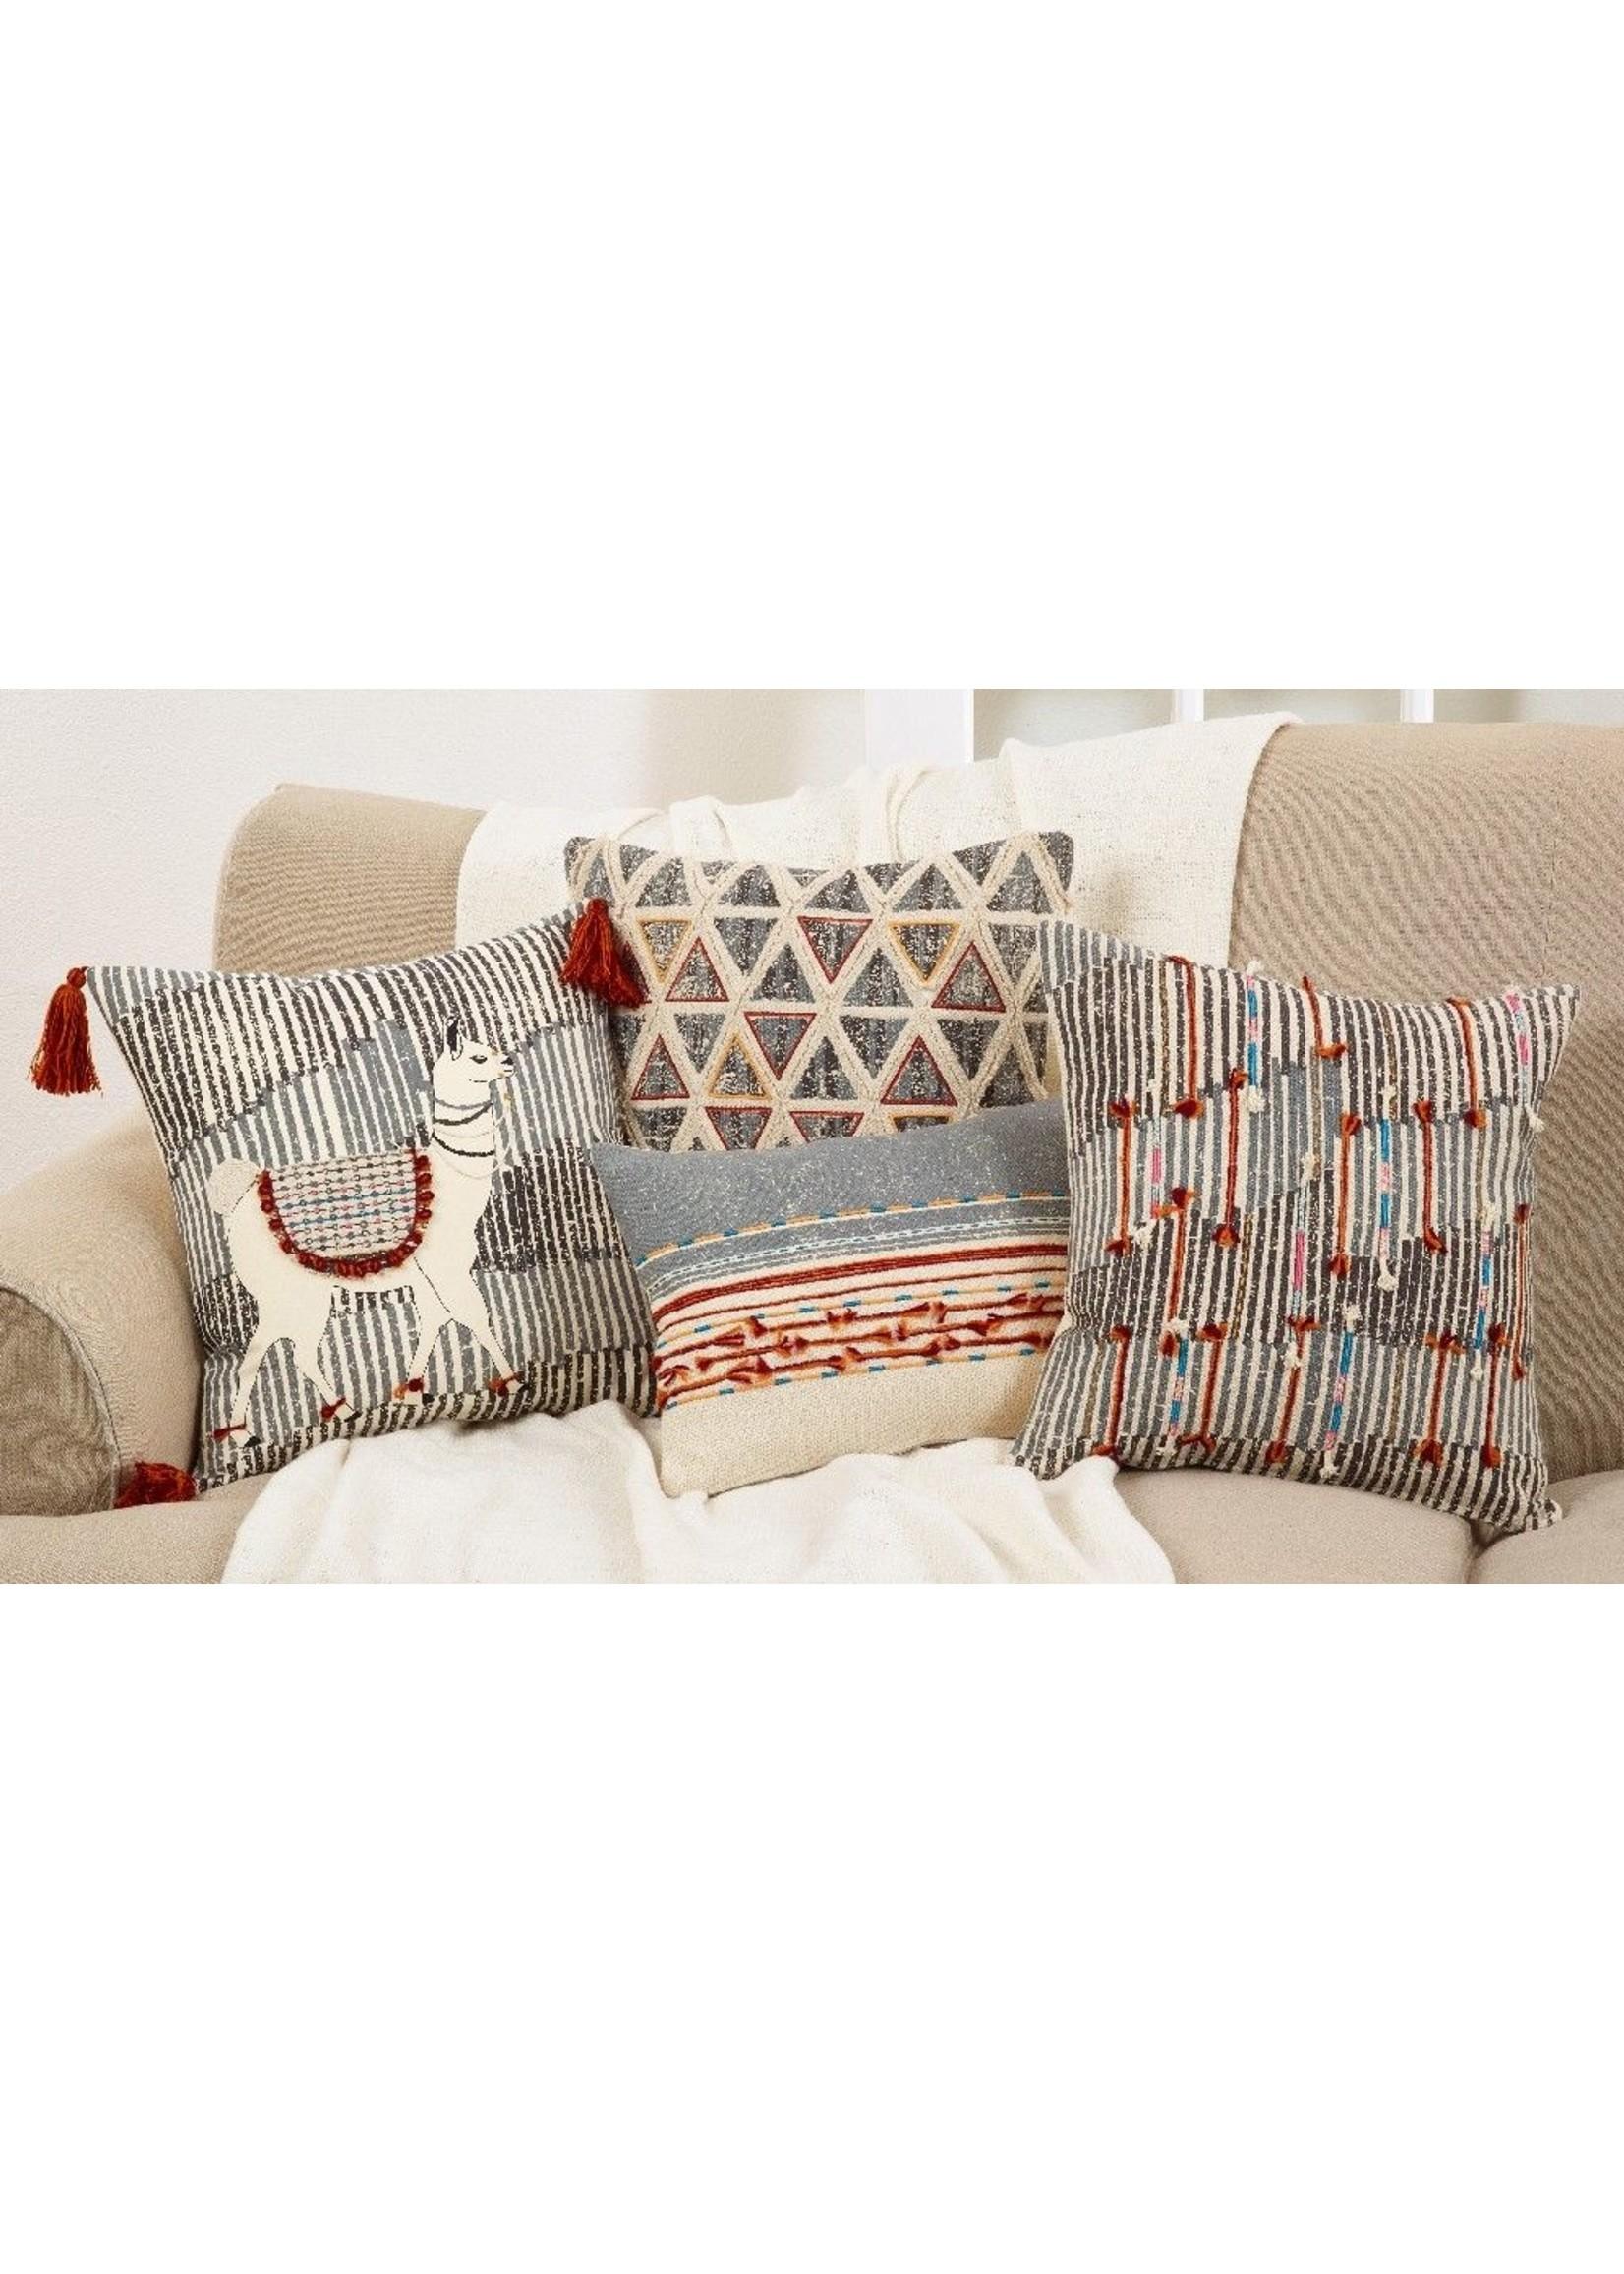 Saro Cord Applique Pillow Down Filled Multi